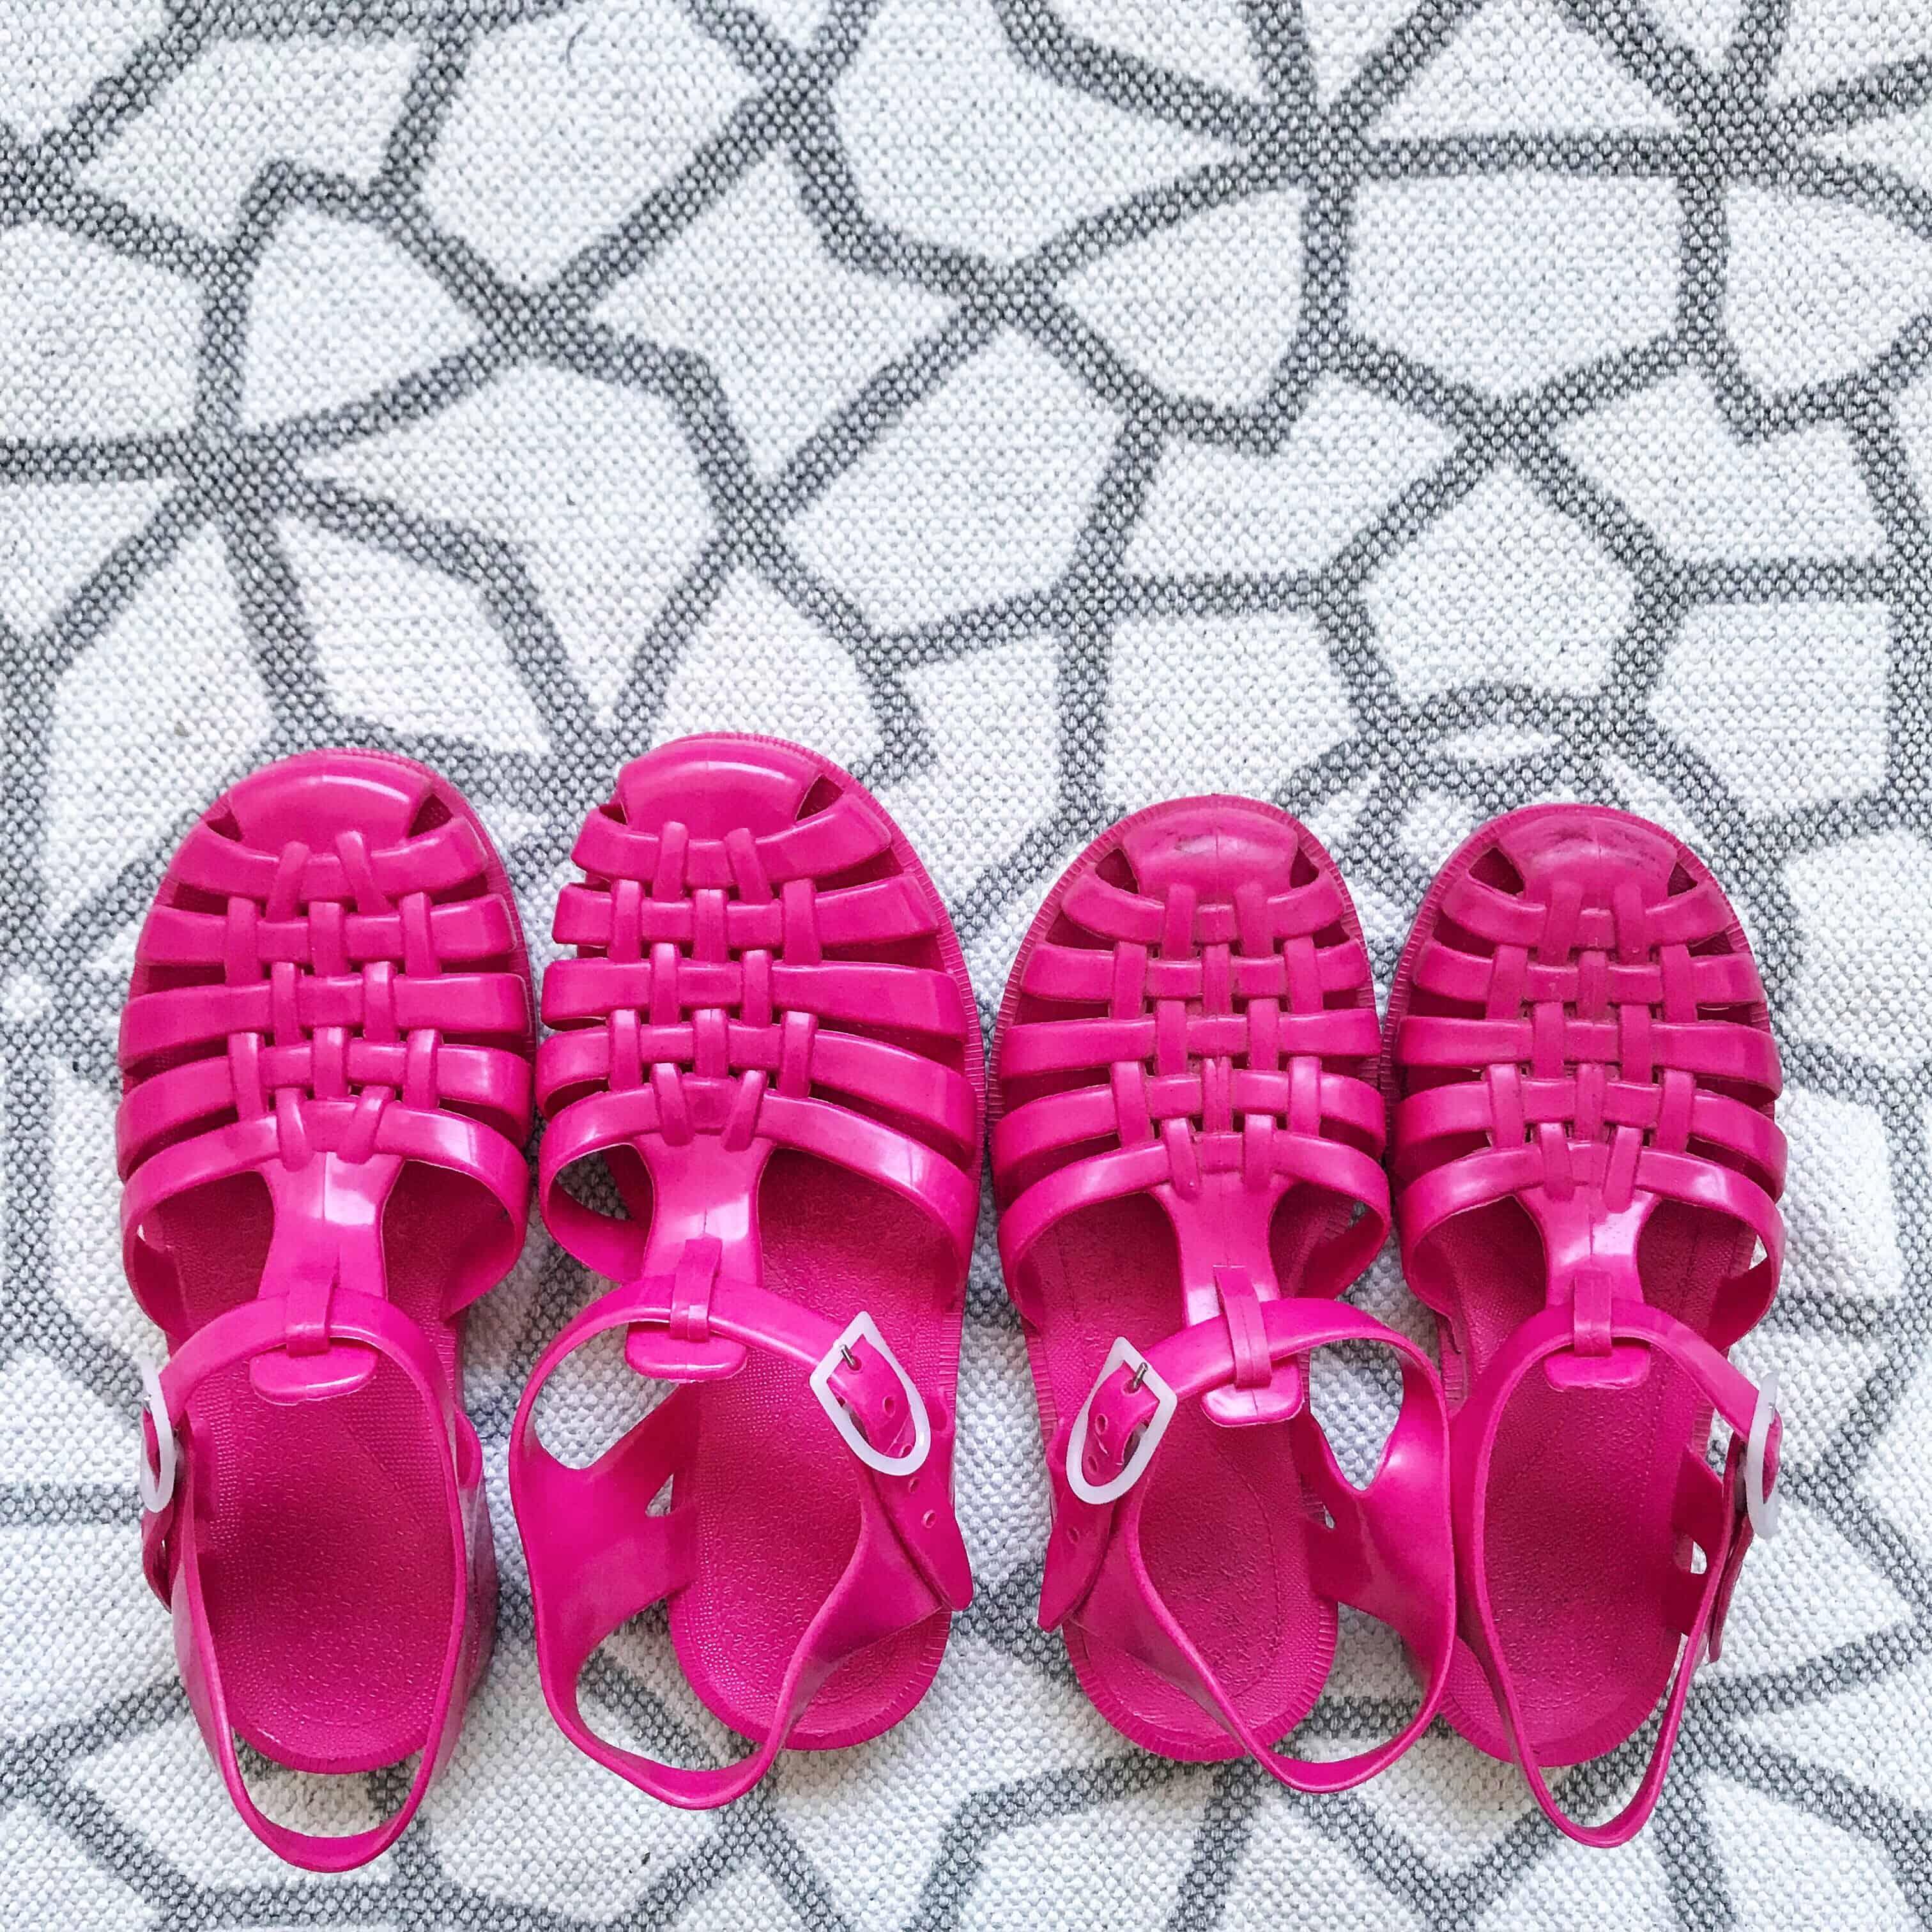 Sun Jellies Raspberry Jelly Shoes